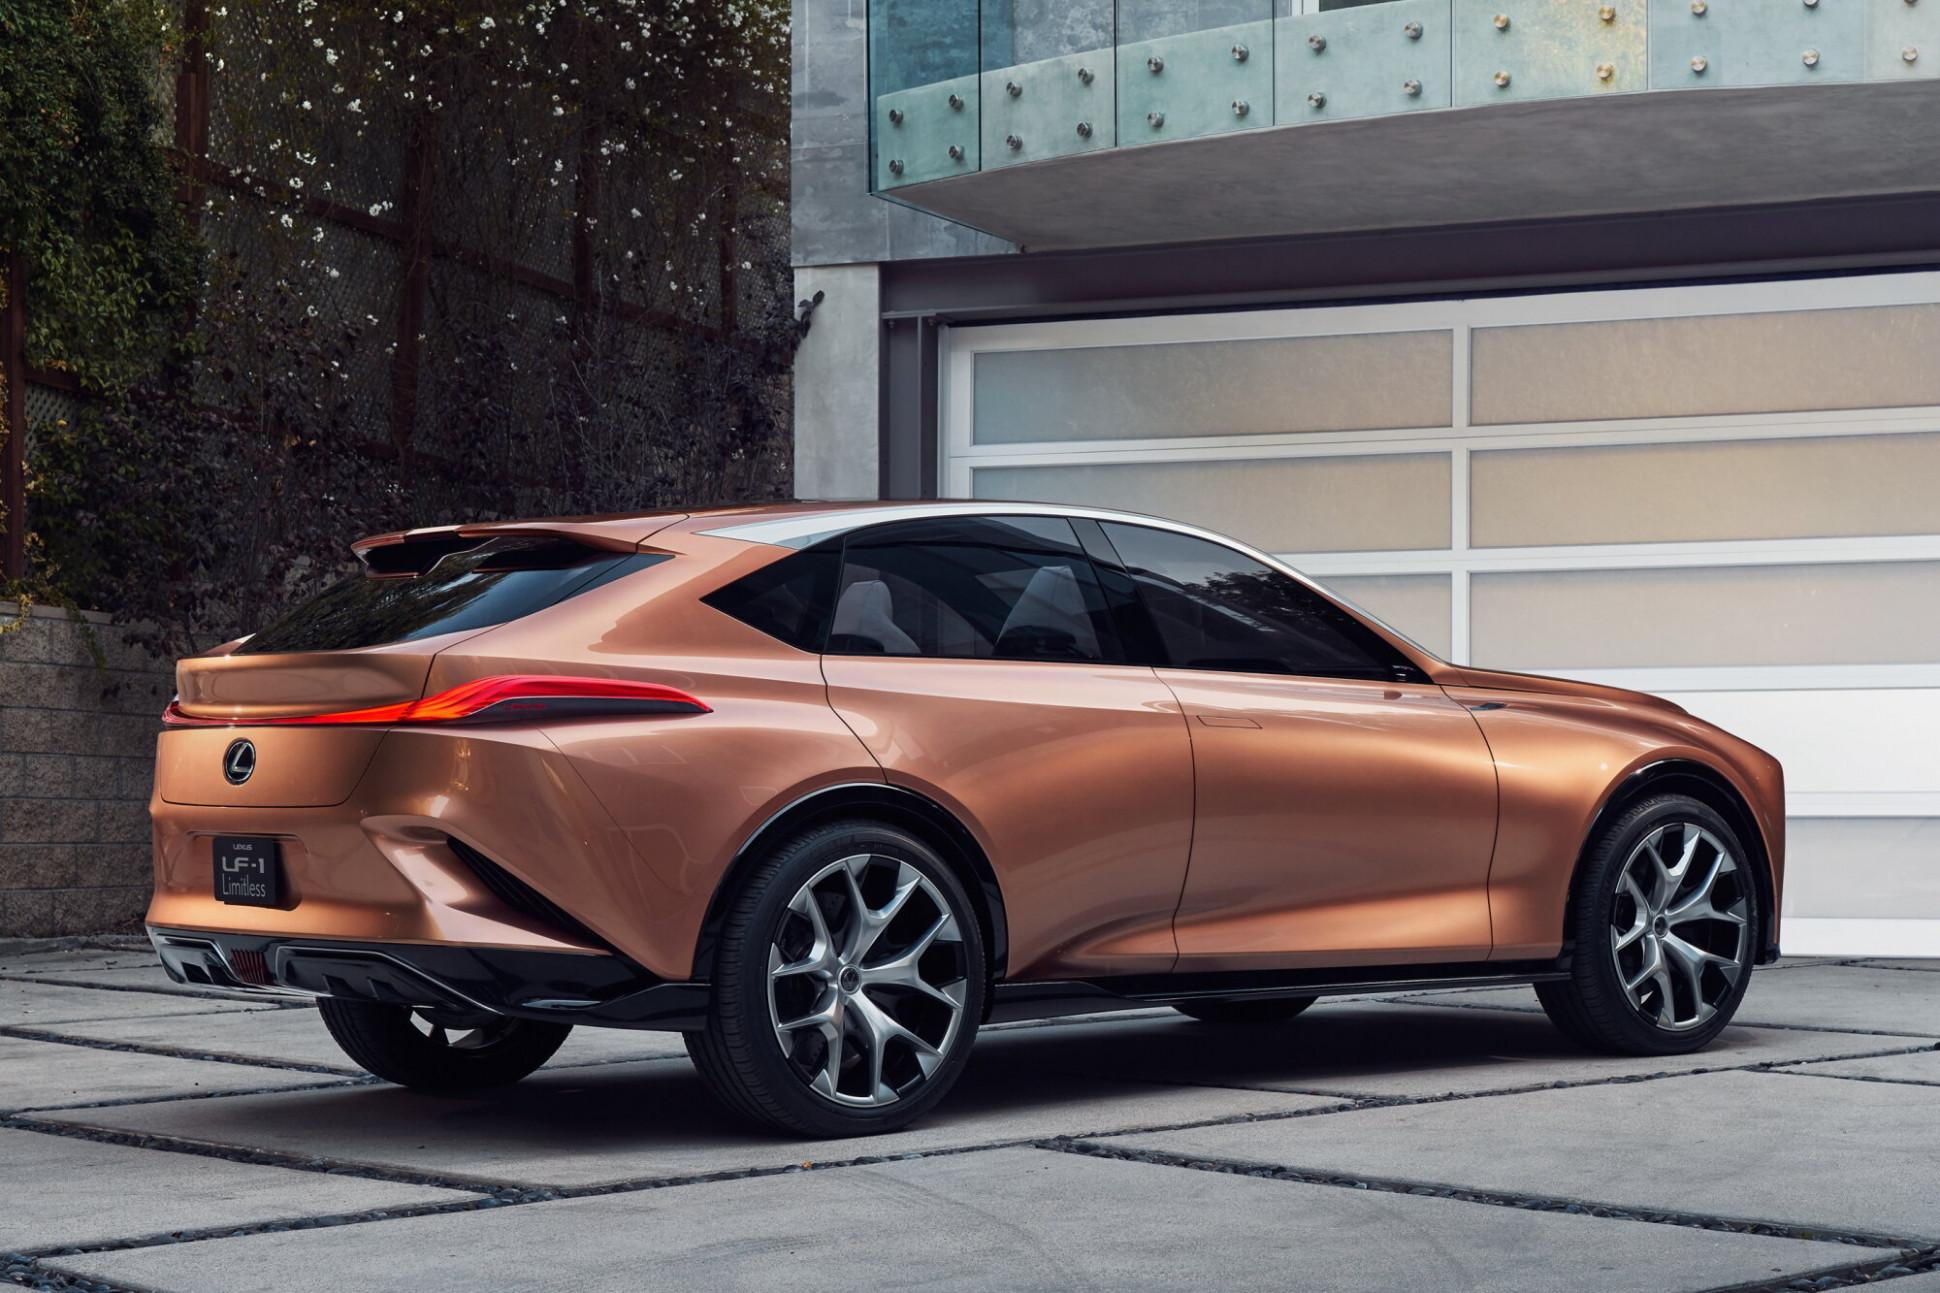 Redesign and Concept 2022 Lexus TX